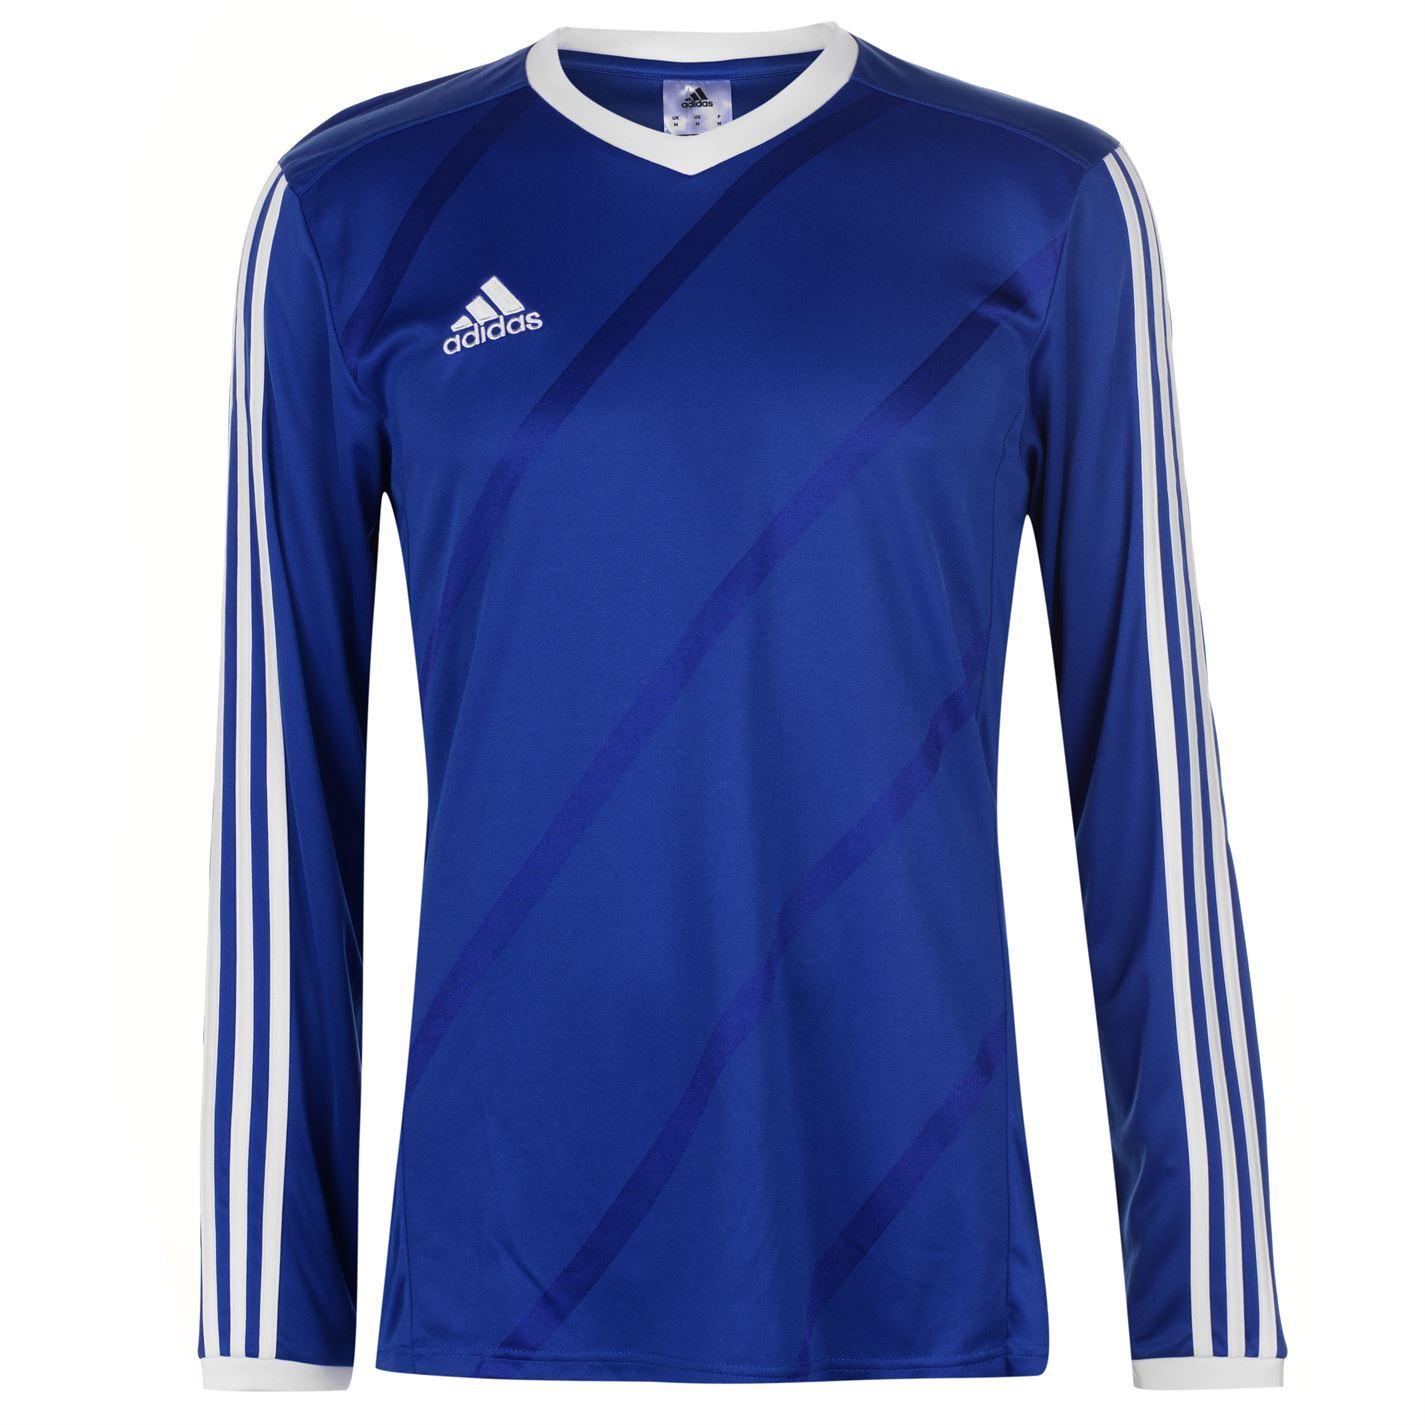 adidas Tabela 14 Long Sleeve Football Jersey Mens Soccer Shirt Top ...